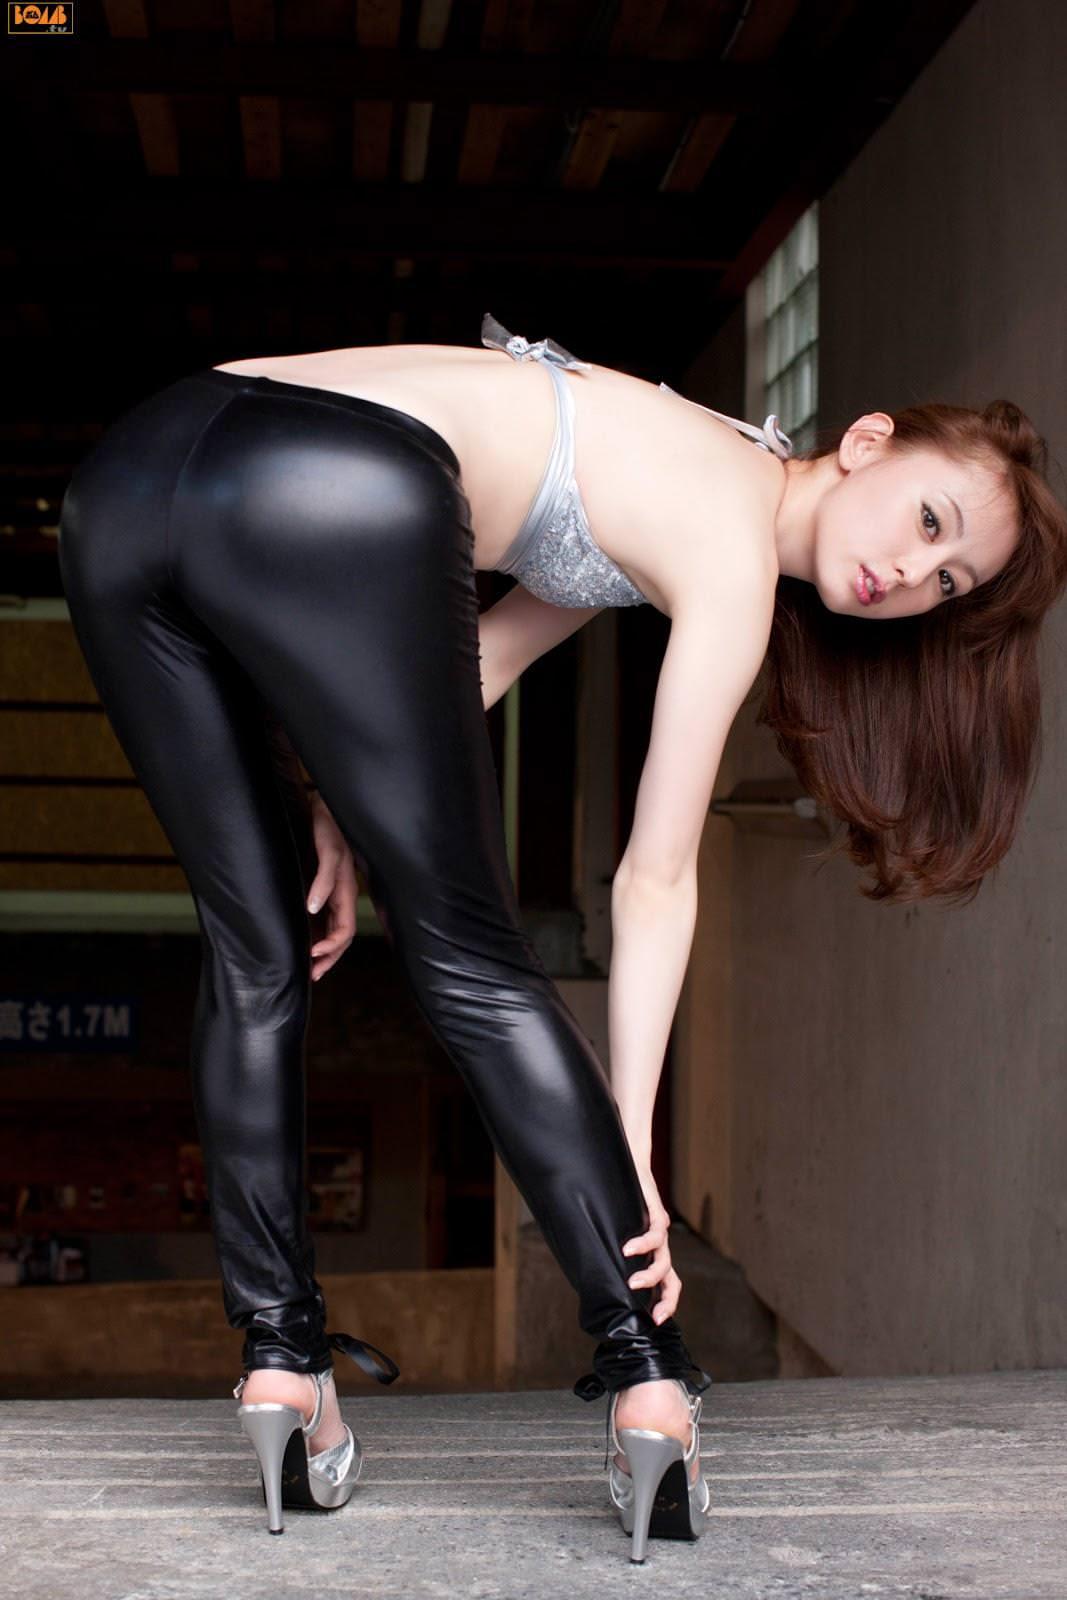 Rina Akiyama – Tight Black